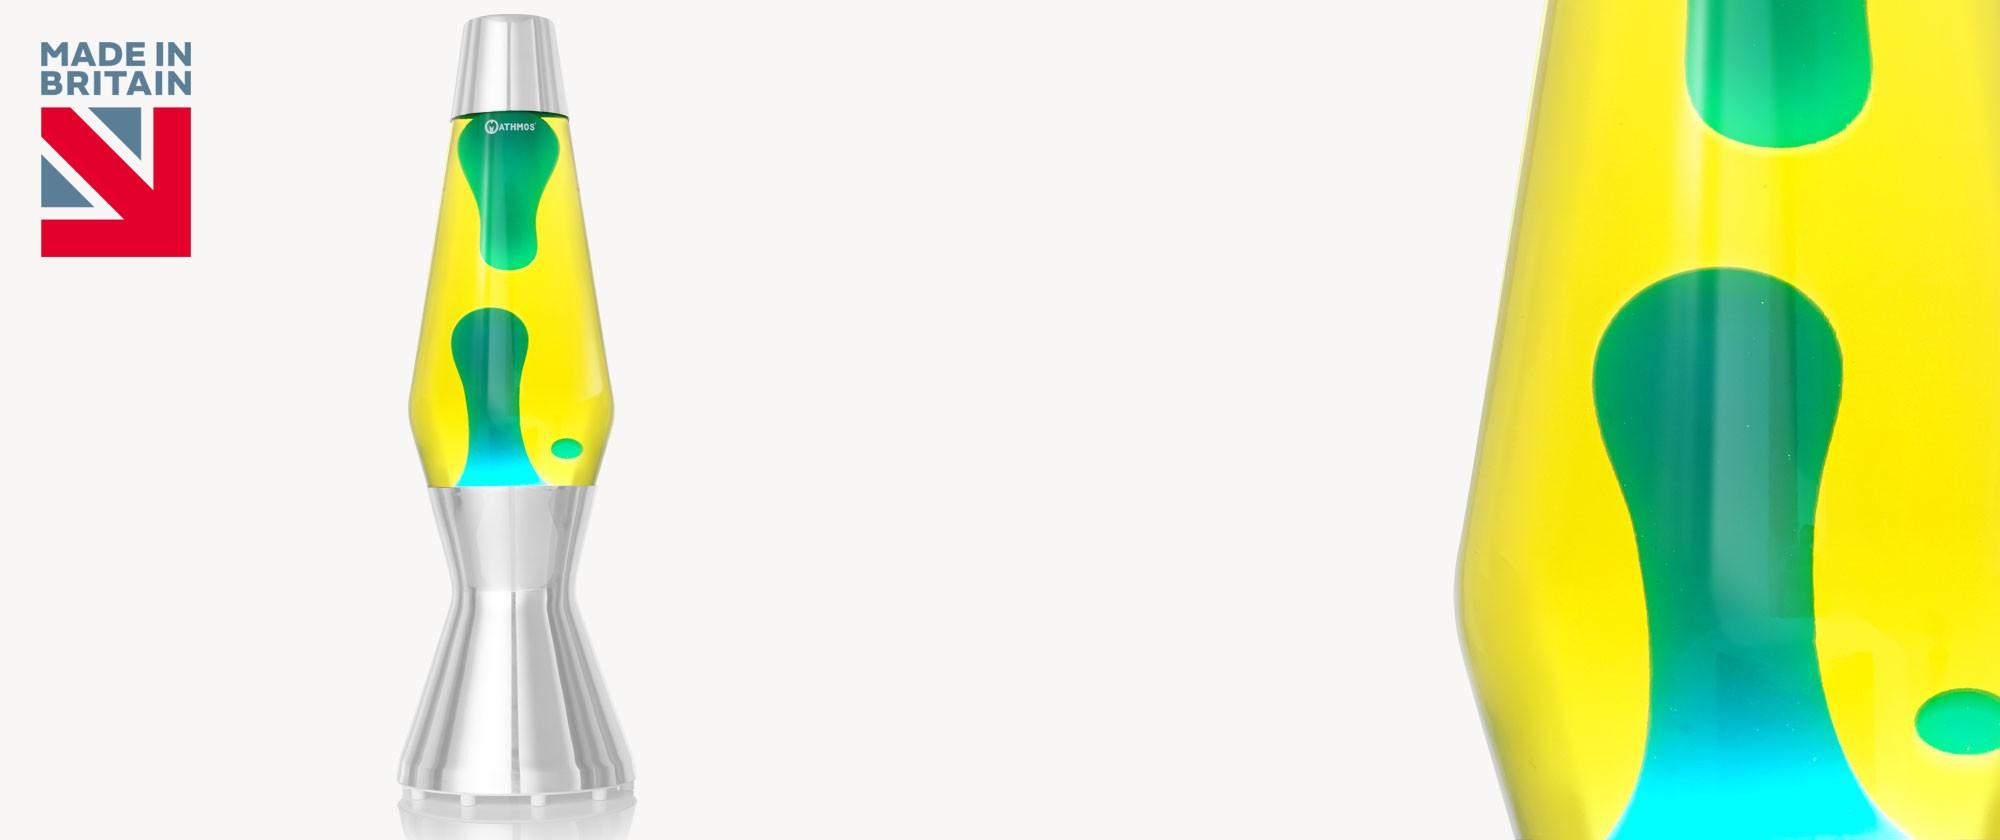 Astro lava lamp bottle Yellow-Blue